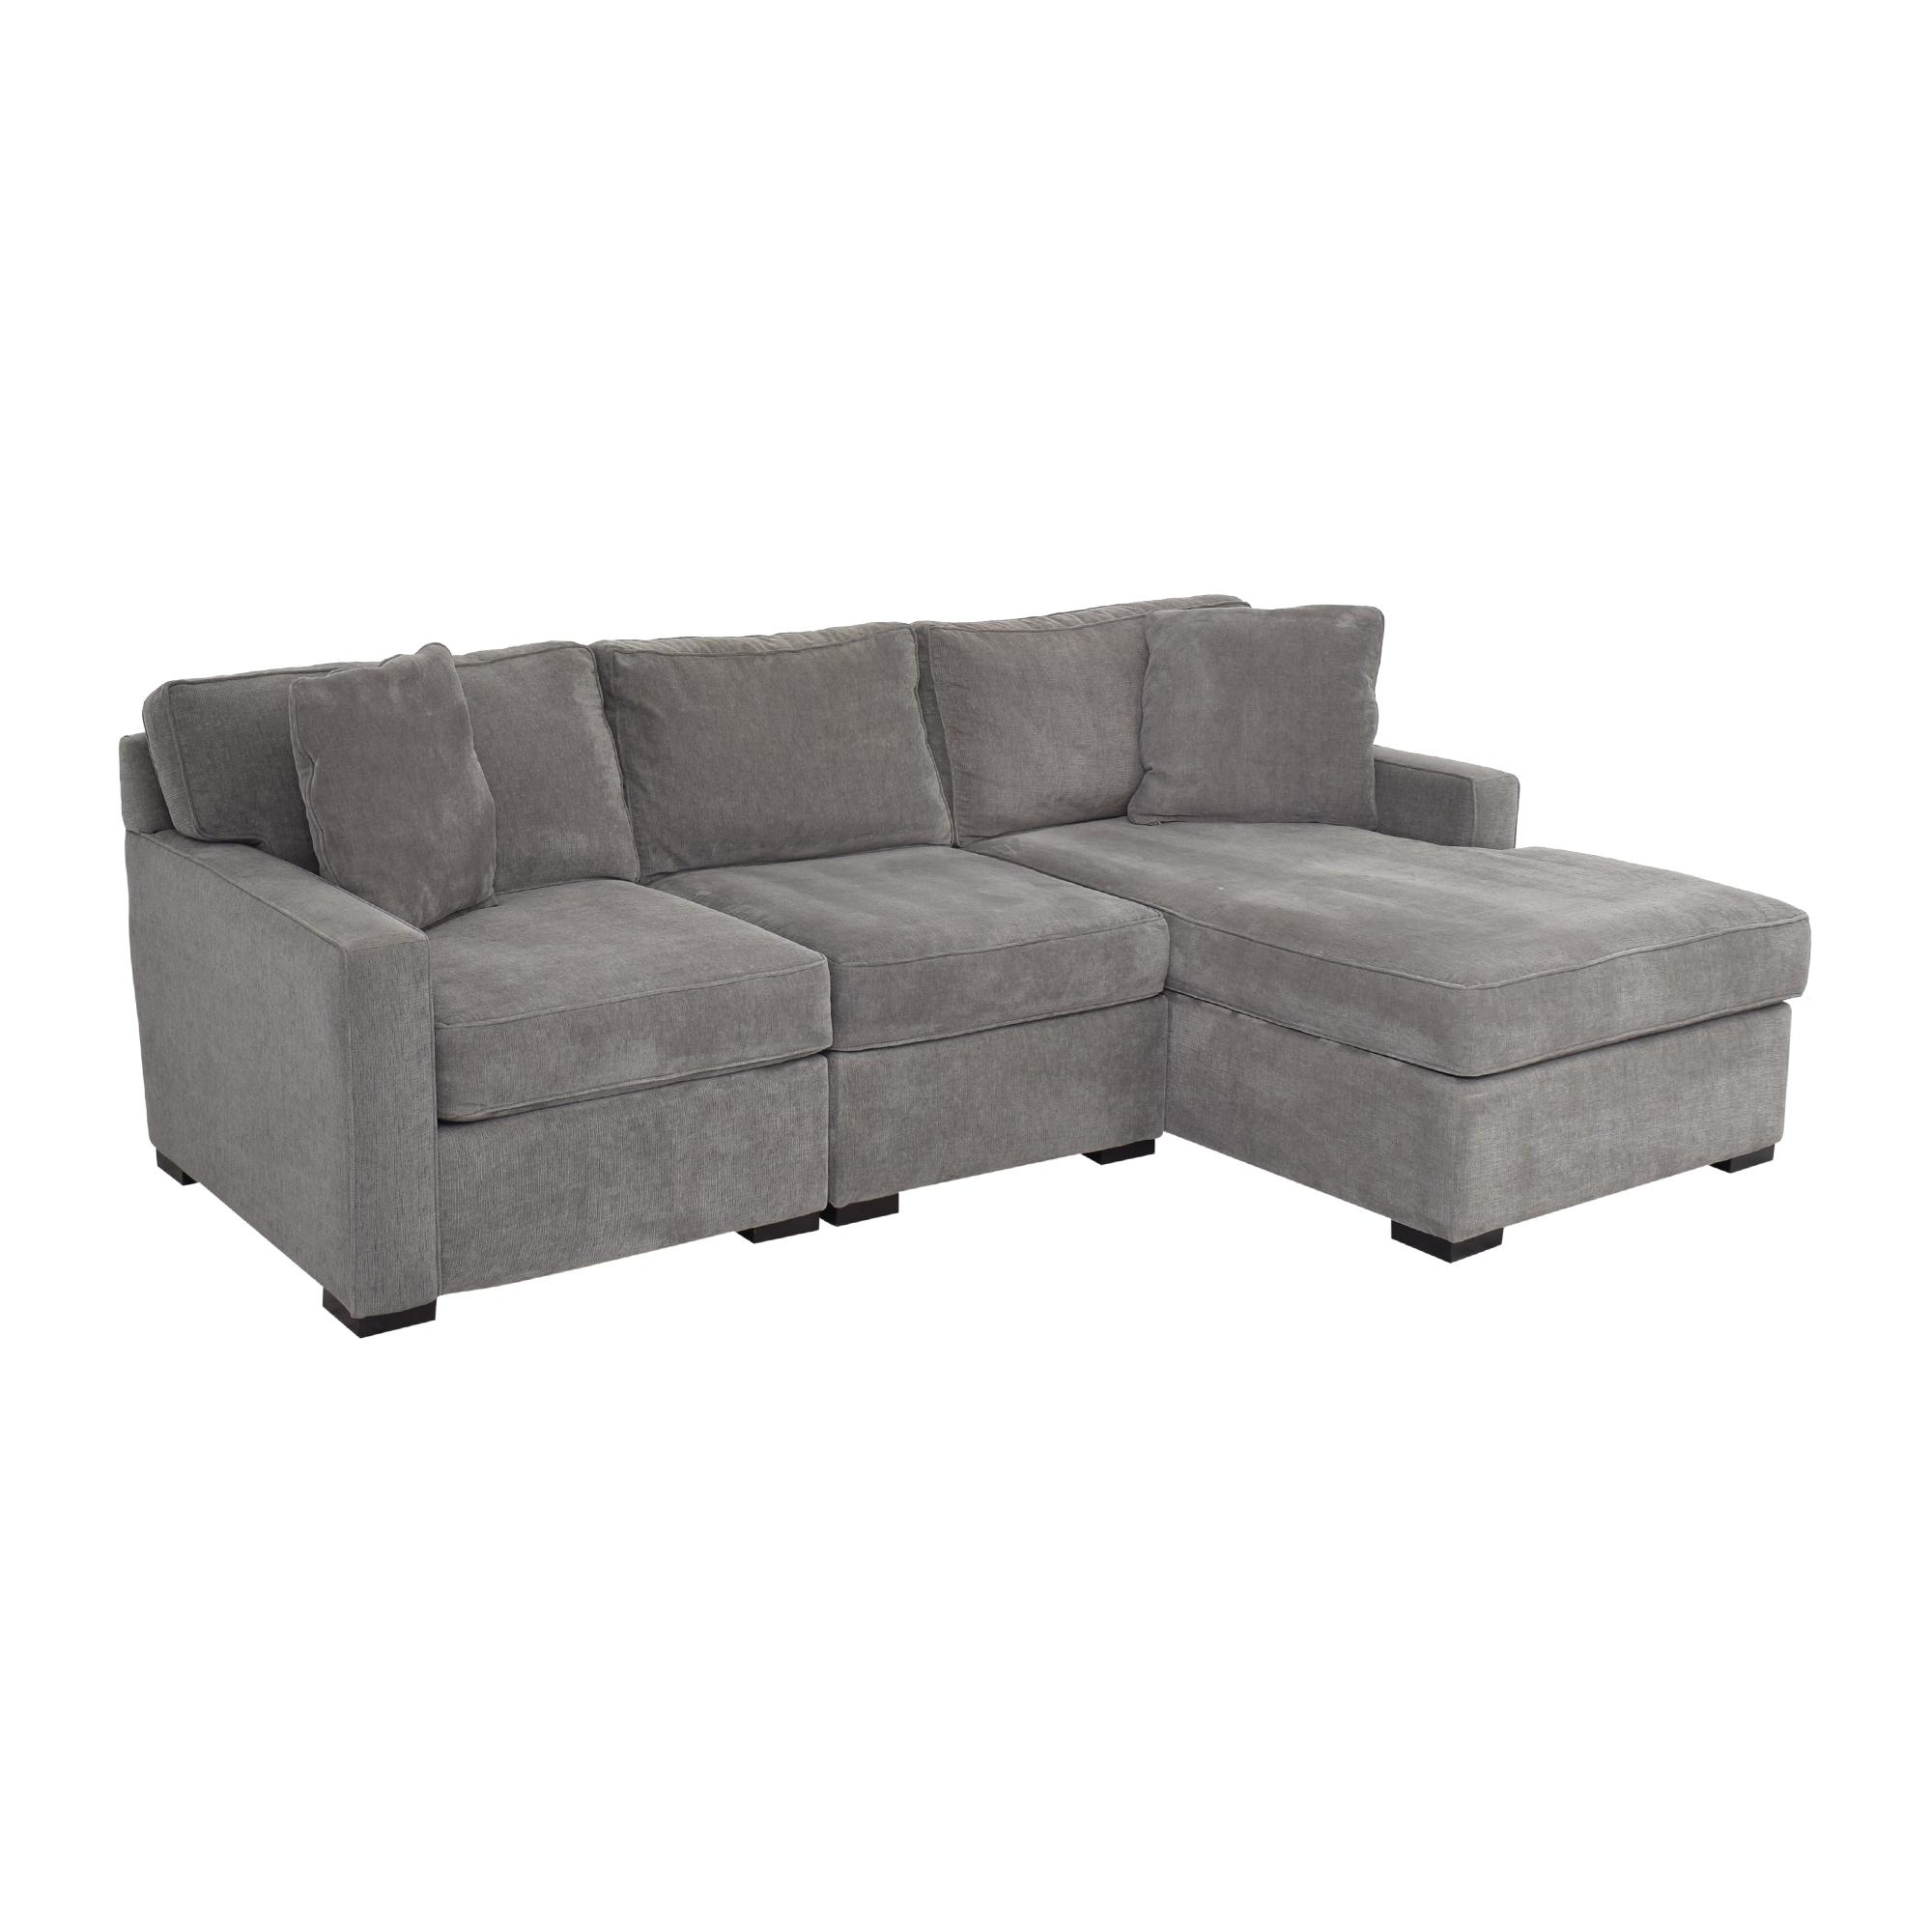 Macy's Macy's Radley Three Piece Chaise Sectional Sofa discount